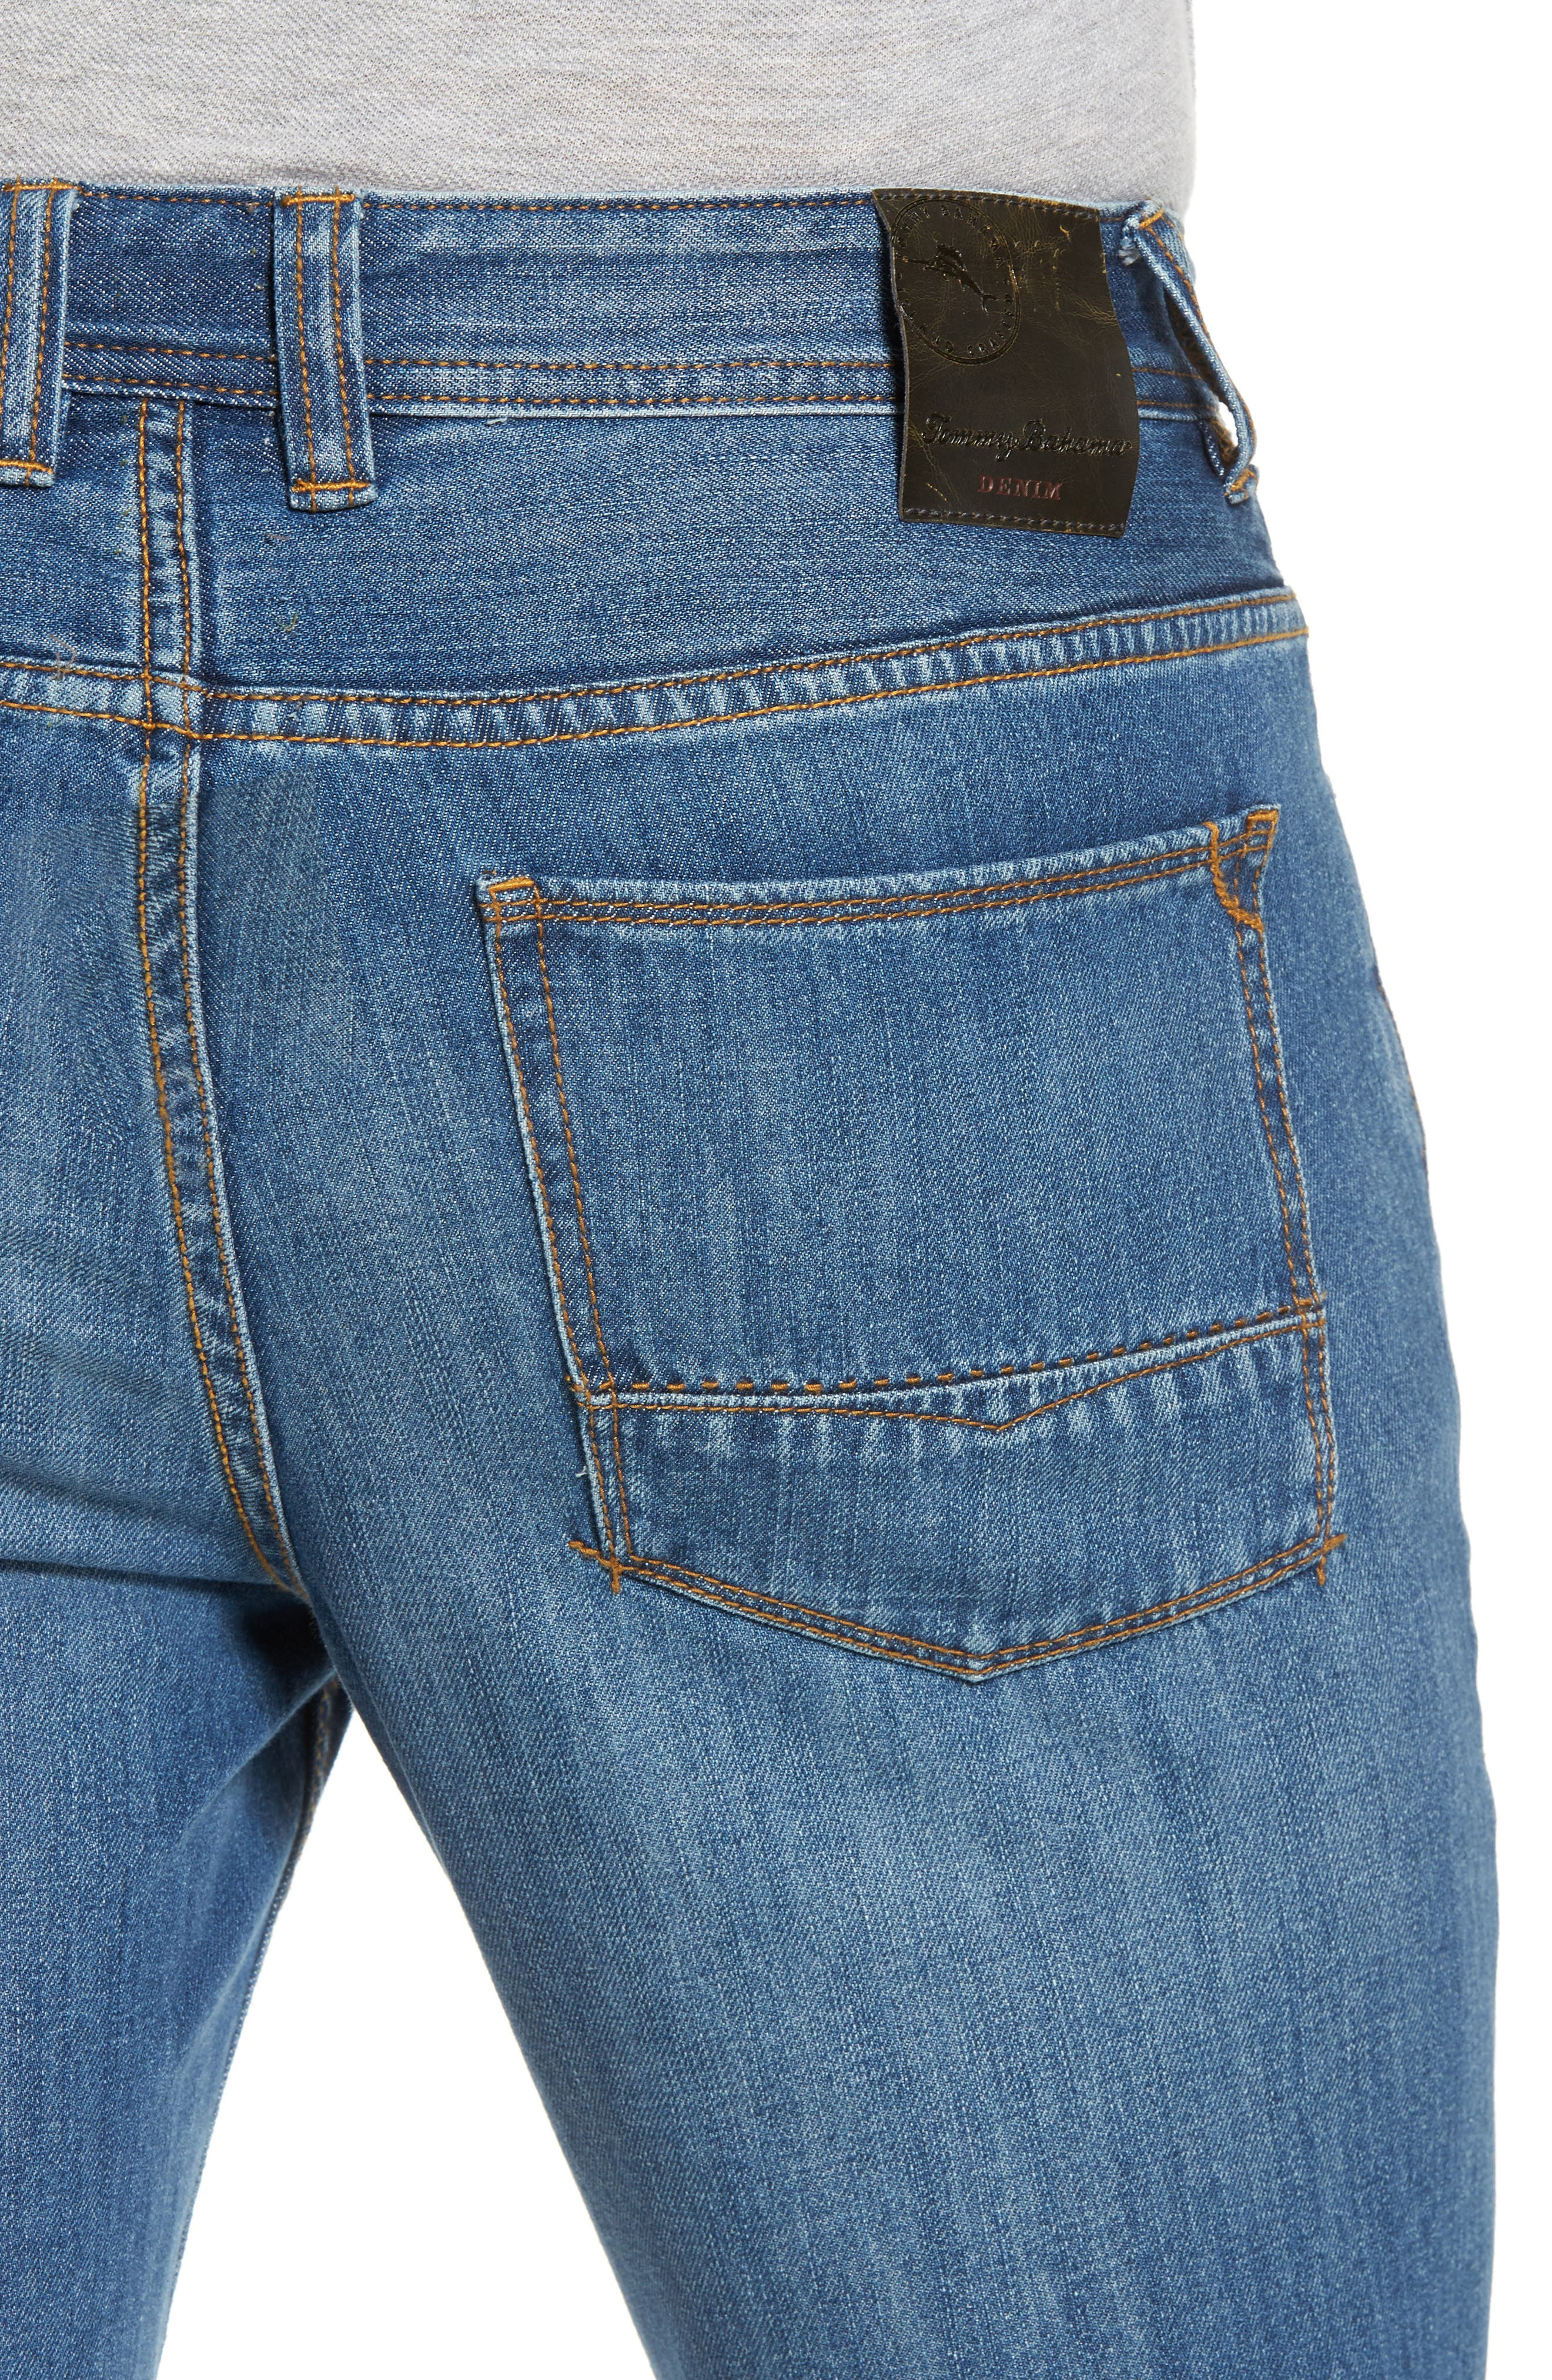 Bardabos Straight Leg Jeans,                             Alternate thumbnail 5, color,                             400